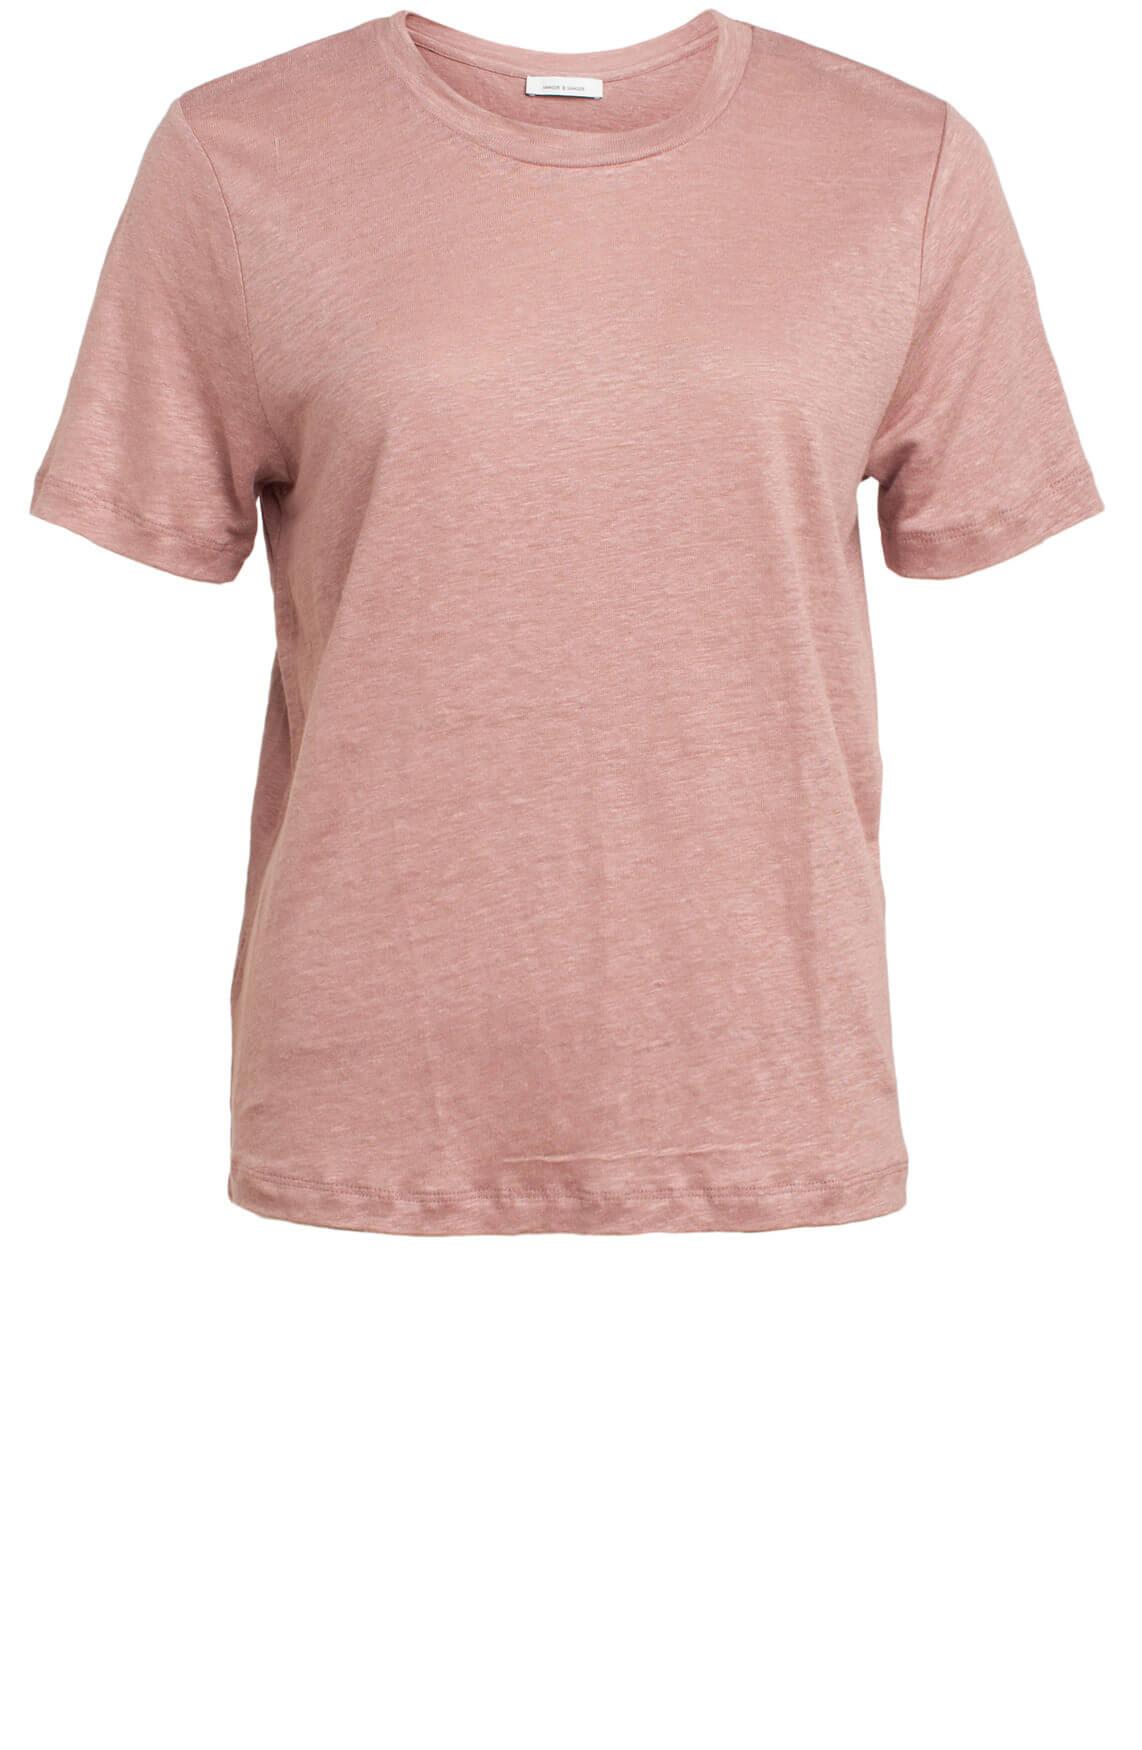 Samsoe Samsoe Dames Agnes shirt roze